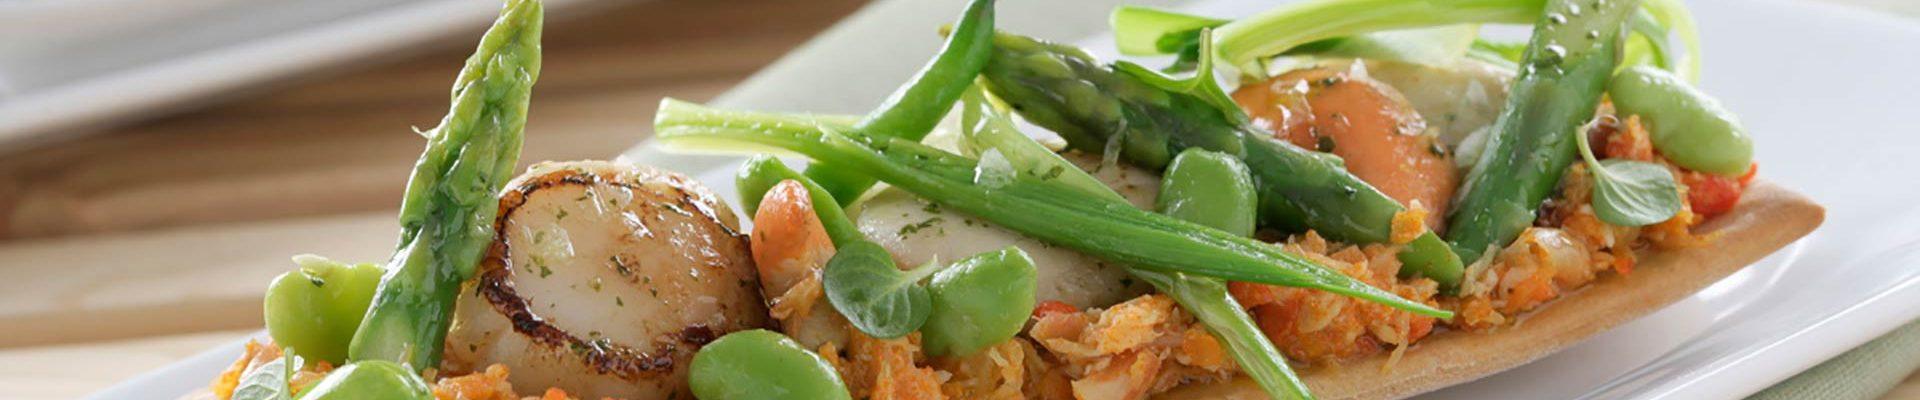 kostaldea-urola-kosta-gastronomika-non-jan